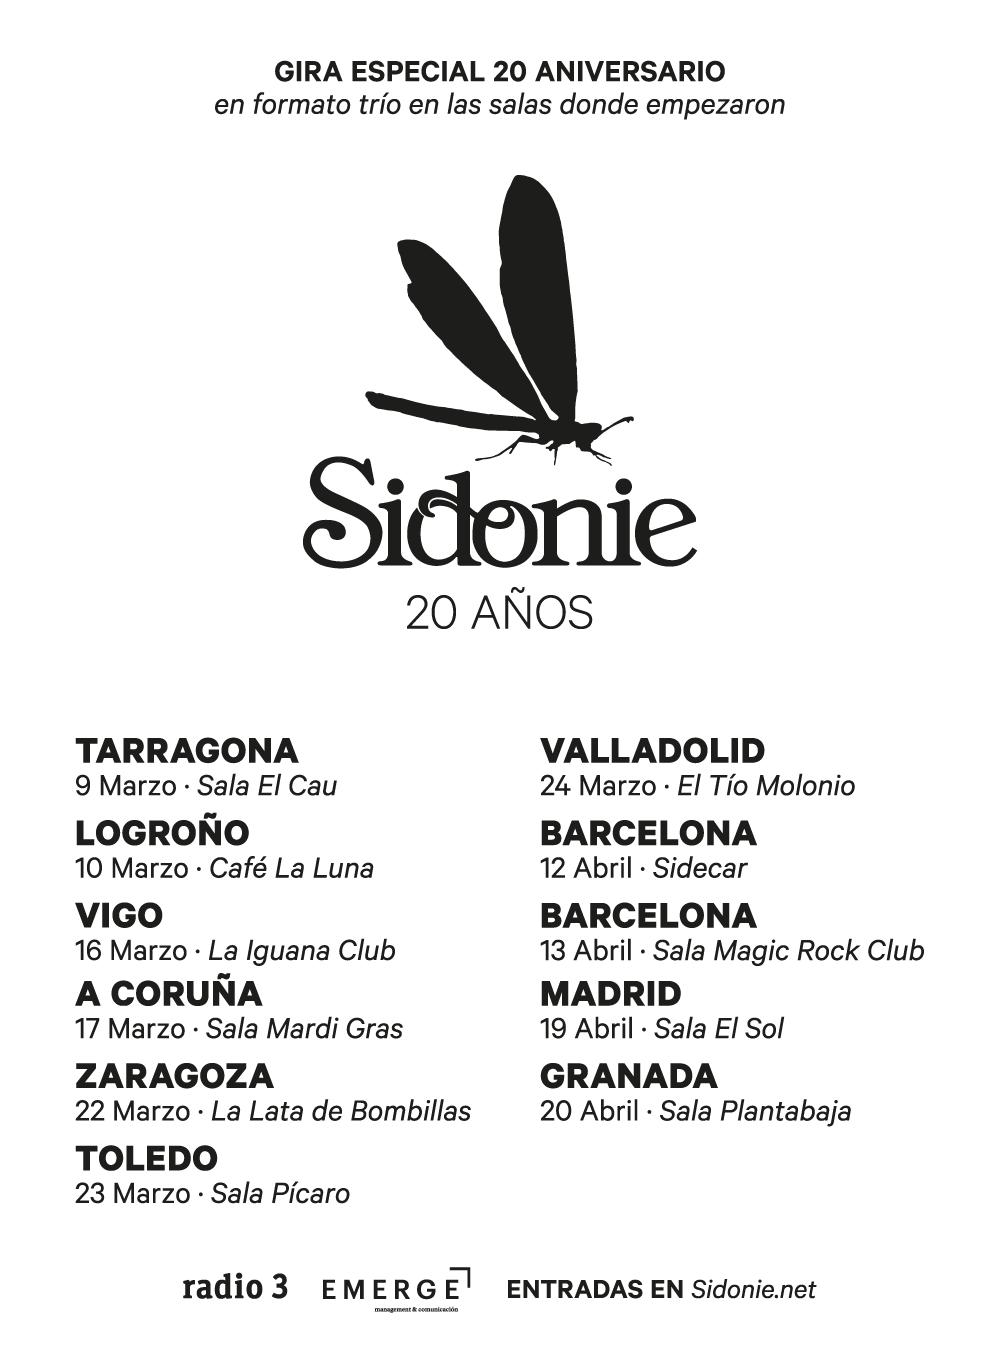 SidonieGira20Años_2018.png